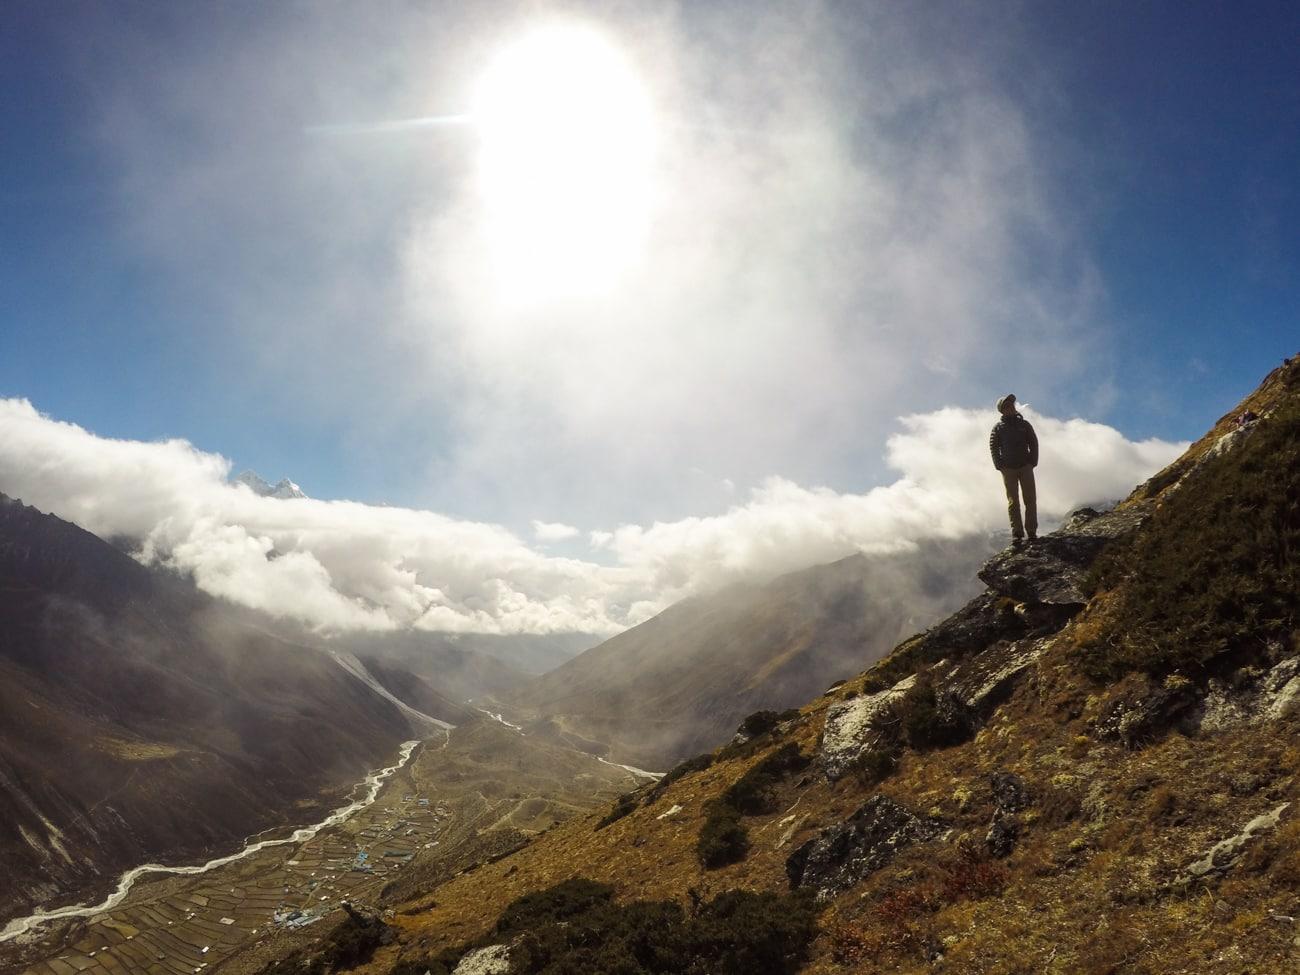 Everest Basecamp trek photos - Debouche